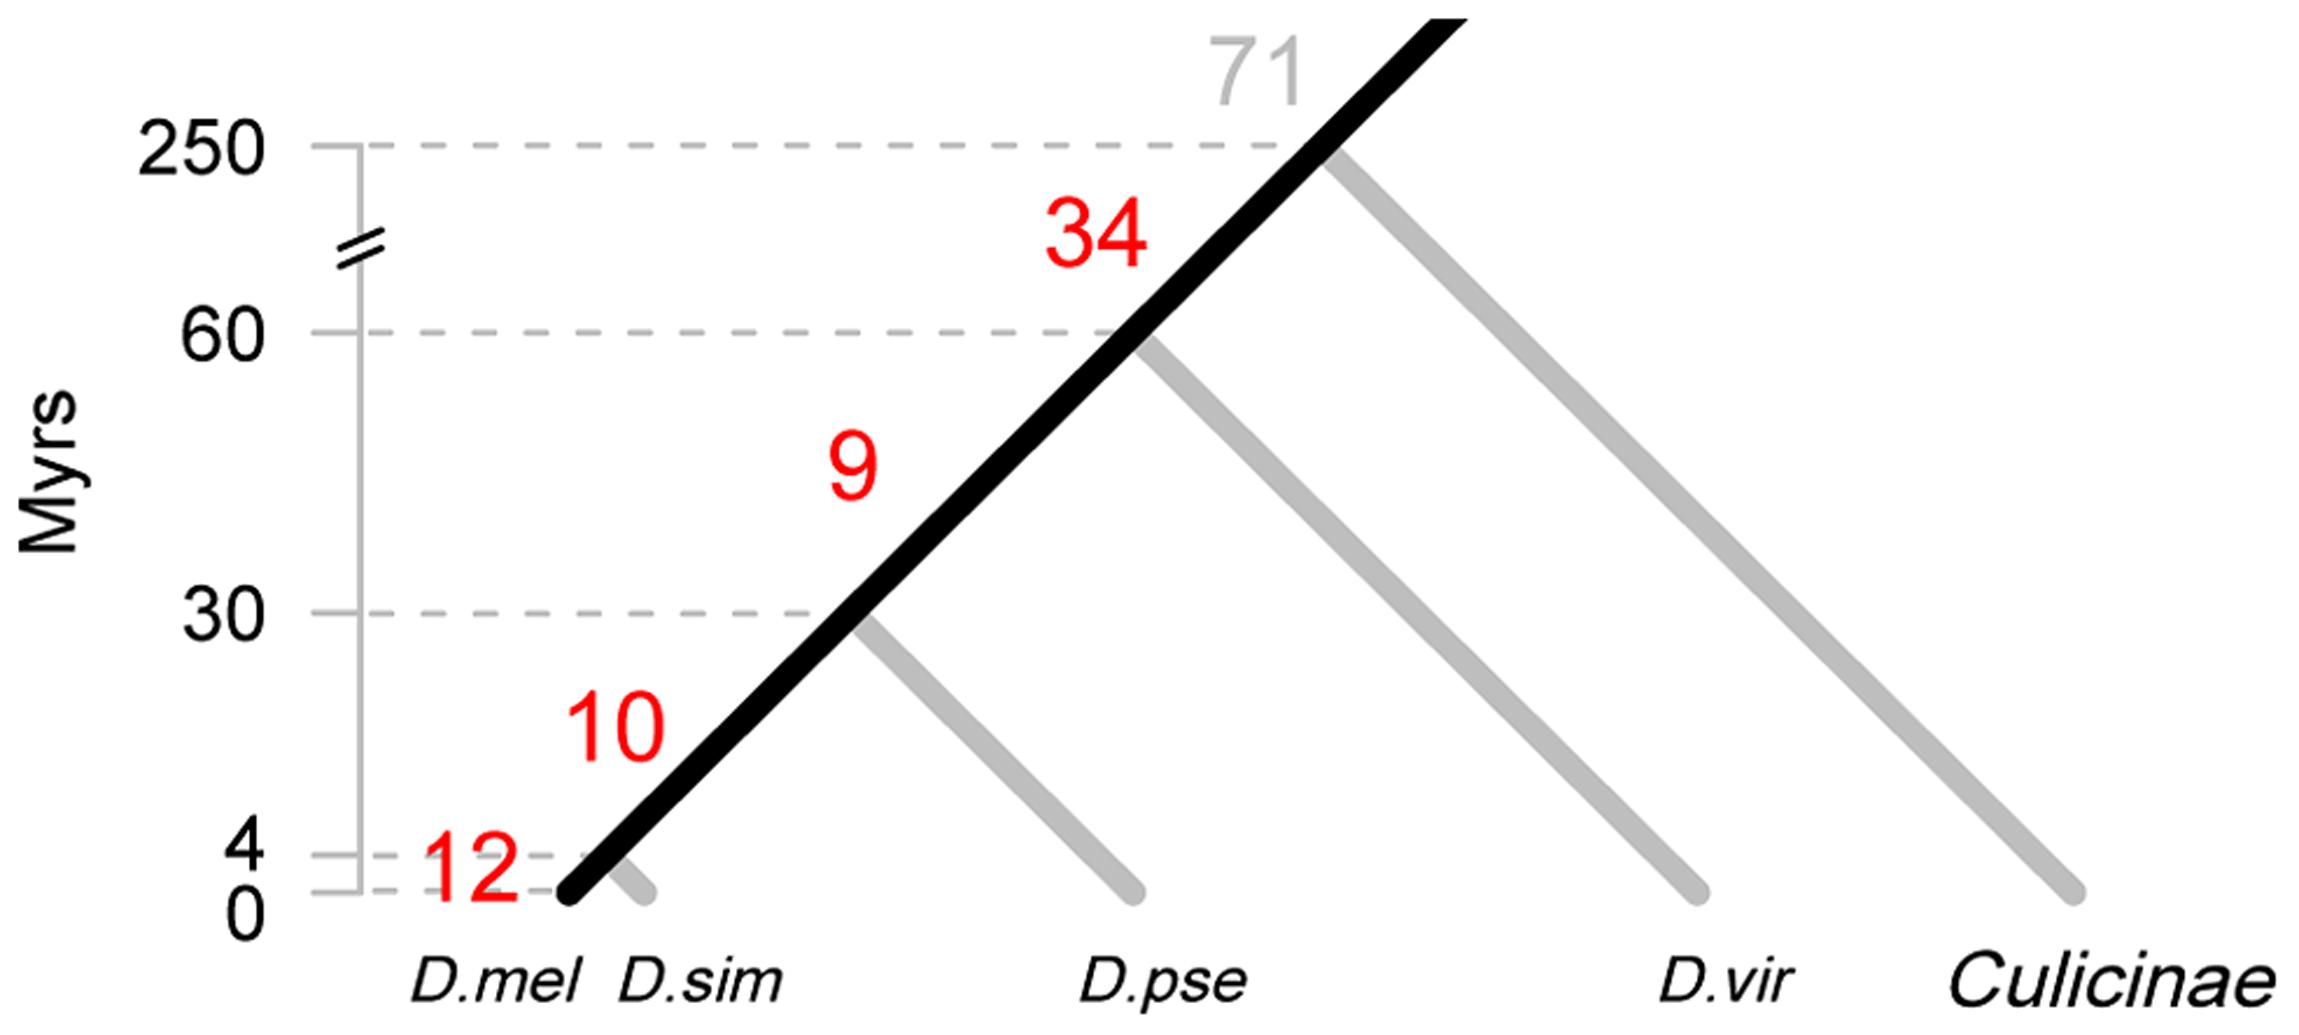 Origin of new miRNAs at different evolutionary periods.